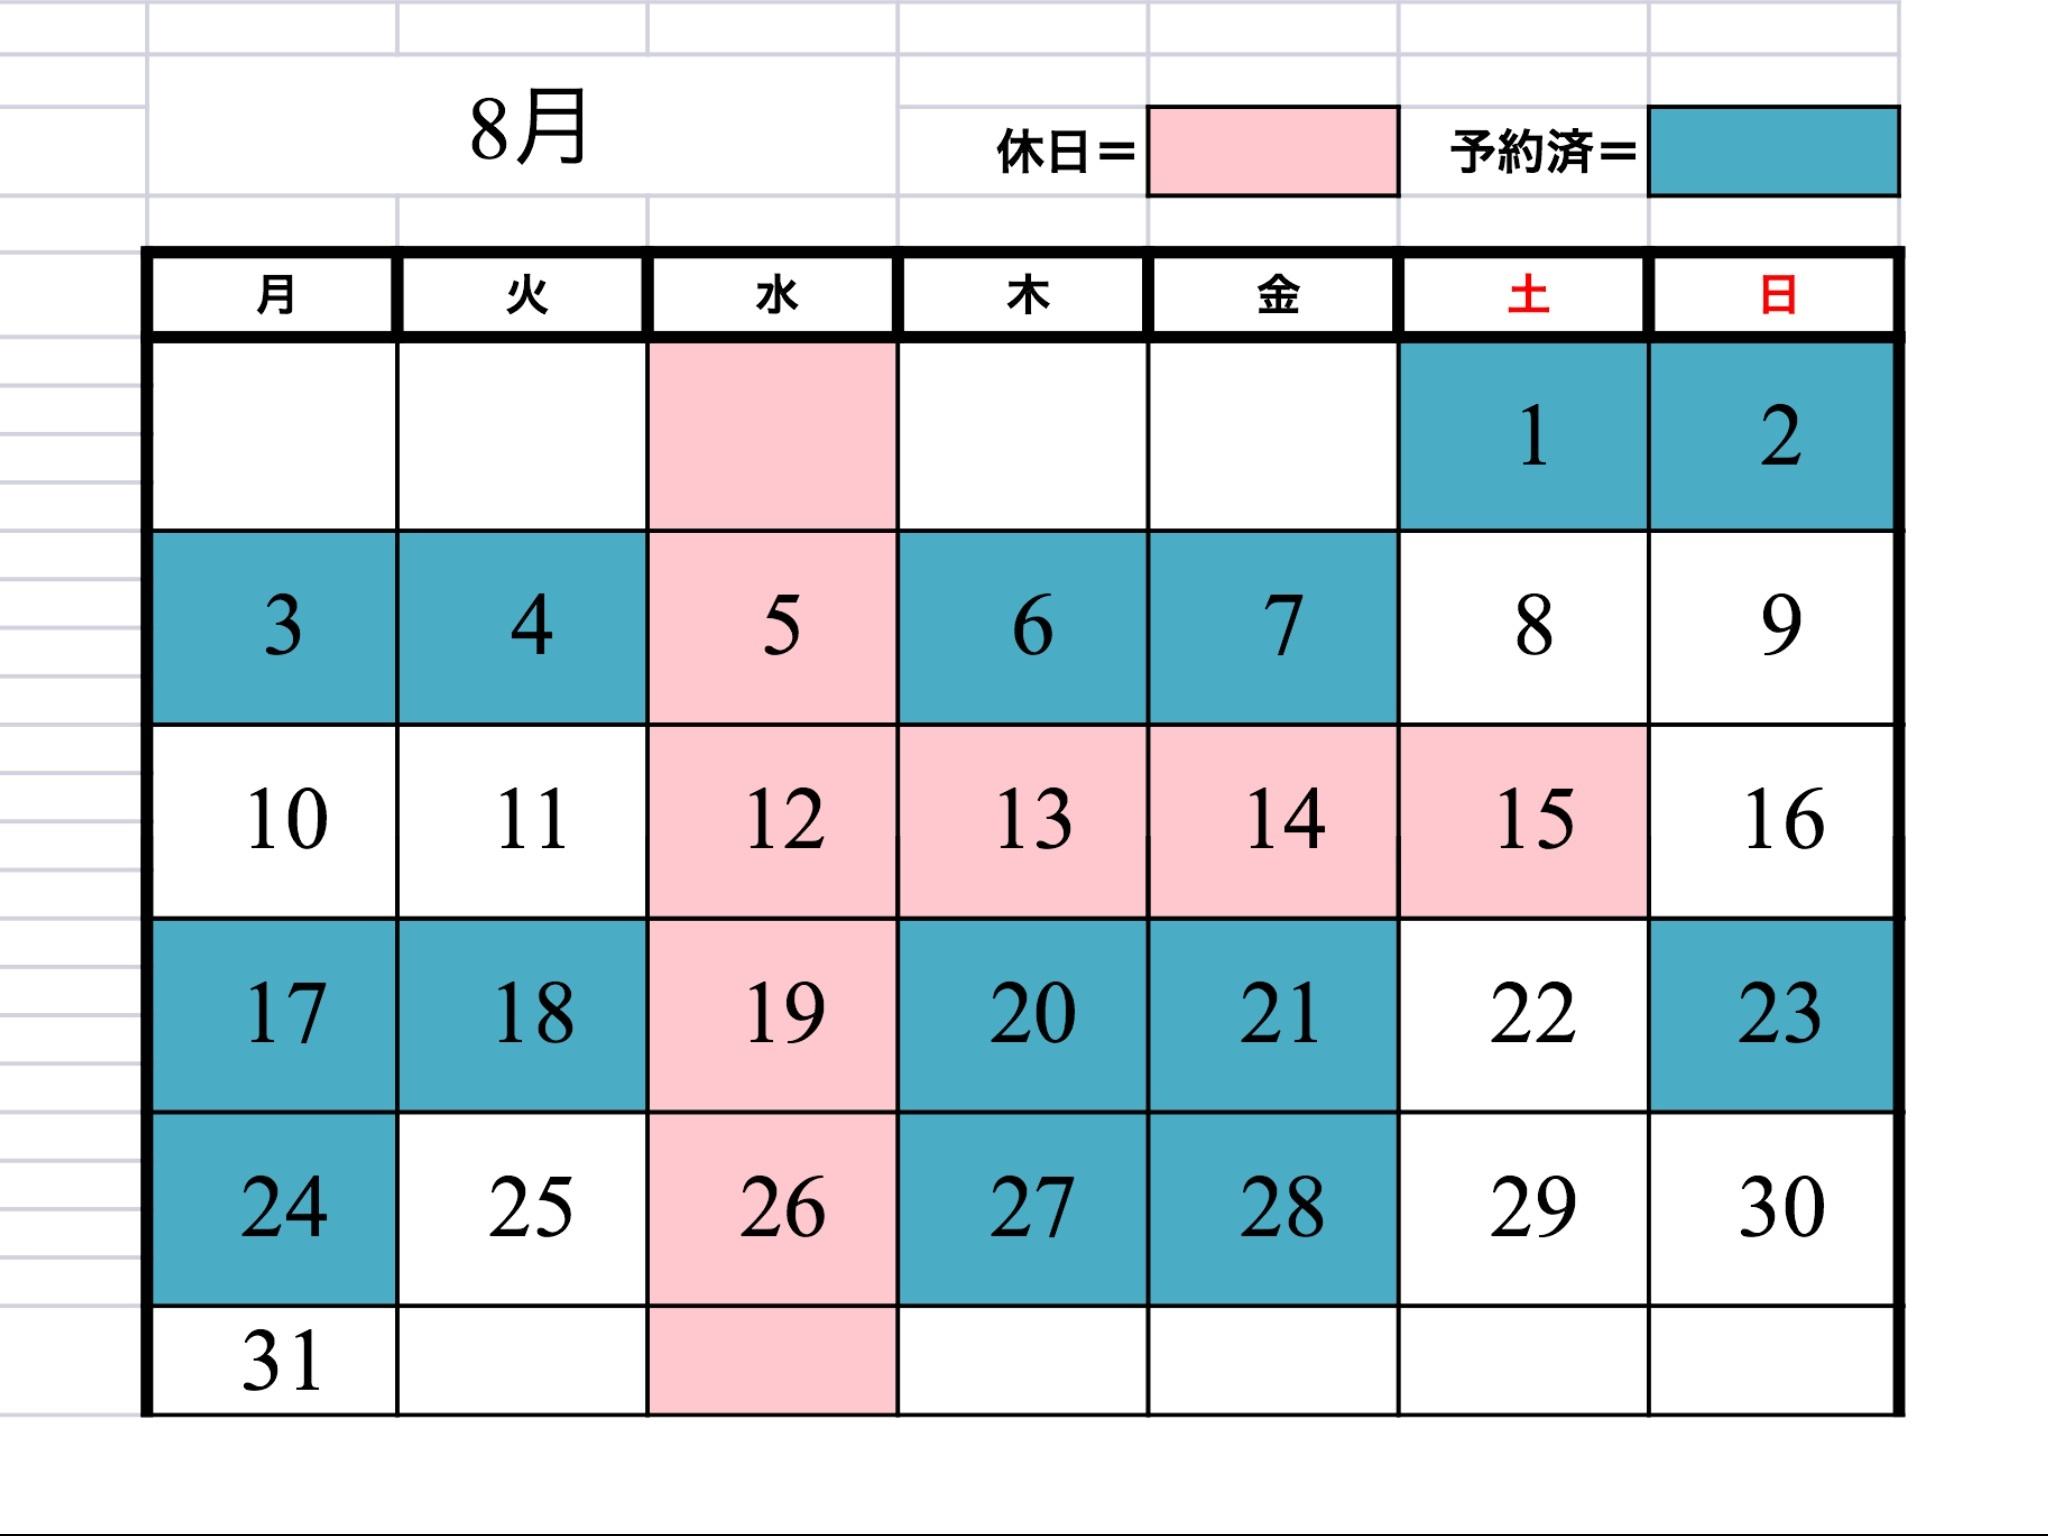 http://www.hyogo-mitsubishi.com/shop/kobekitamachi/files/22f3aba589310afd6a05dd92c452a7d3dccaad94.jpg